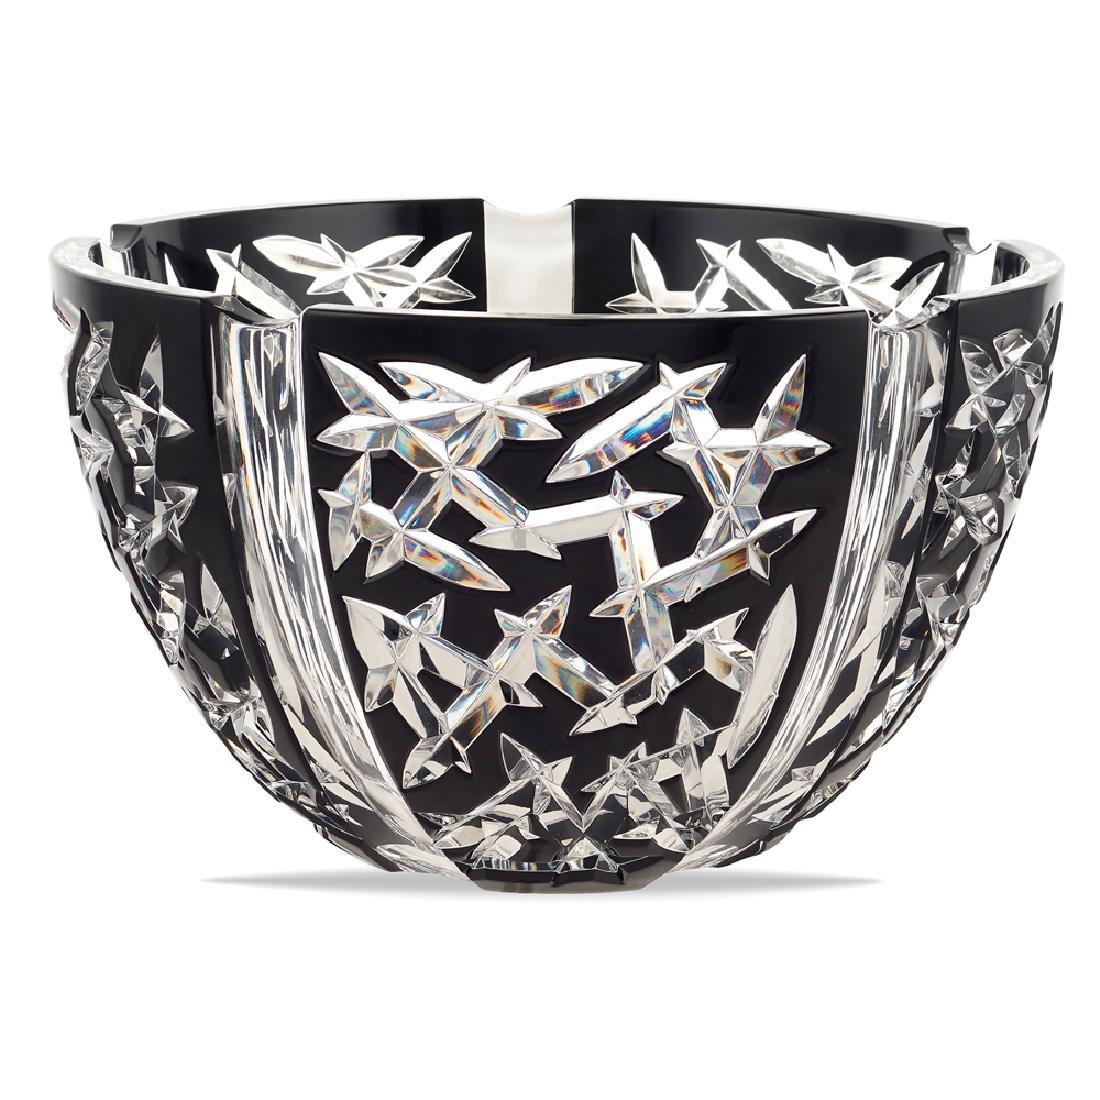 Faberge' crystal bowl Switzerland 20th century d. 26 5